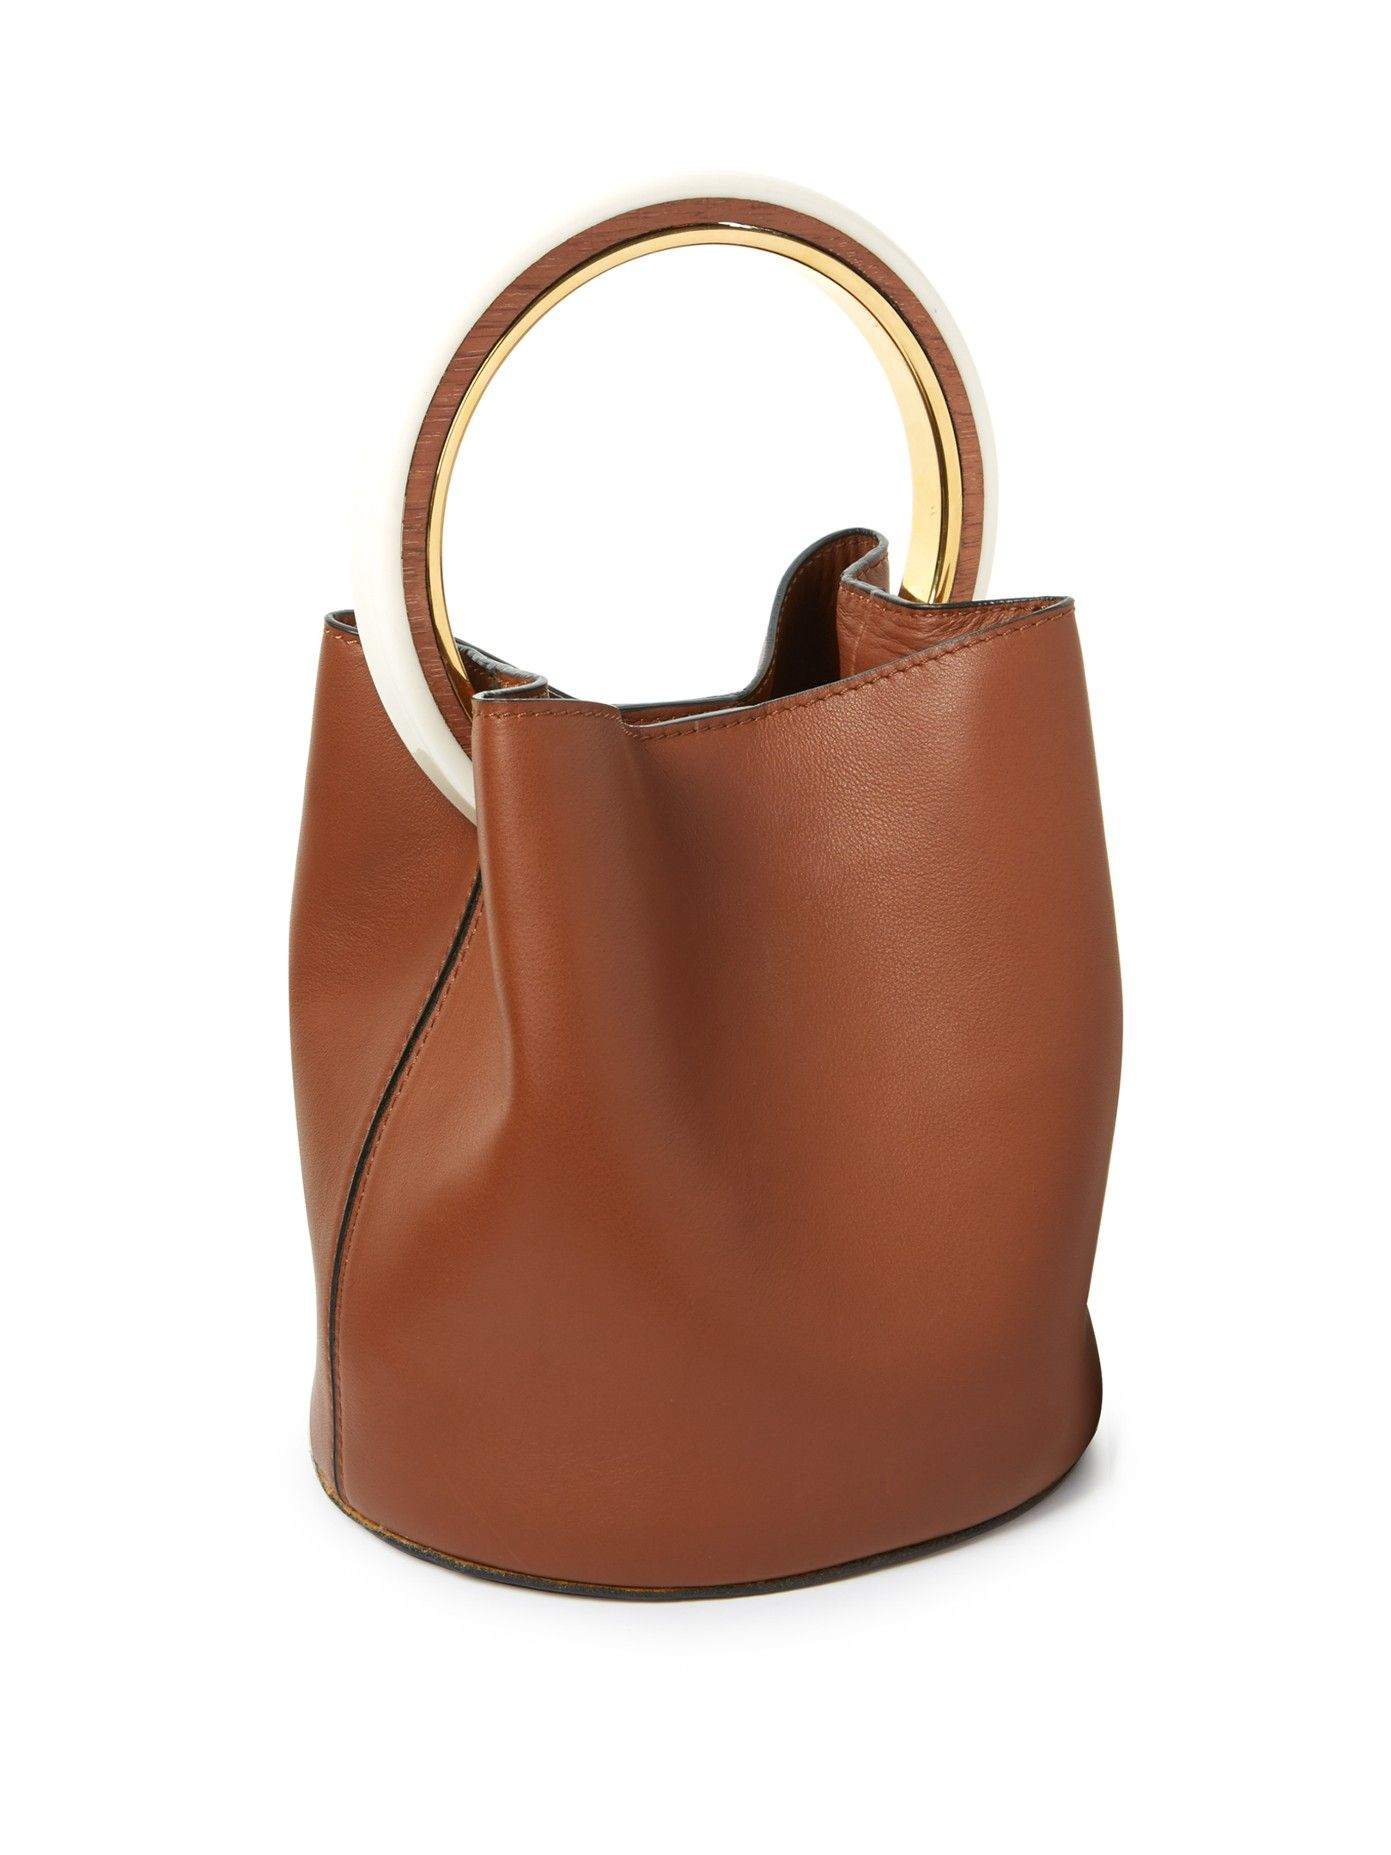 Marni round handled shoulder bag Outlet Ebay Cheap Hot Sale Discount Amazing Price 4KoTRq7O